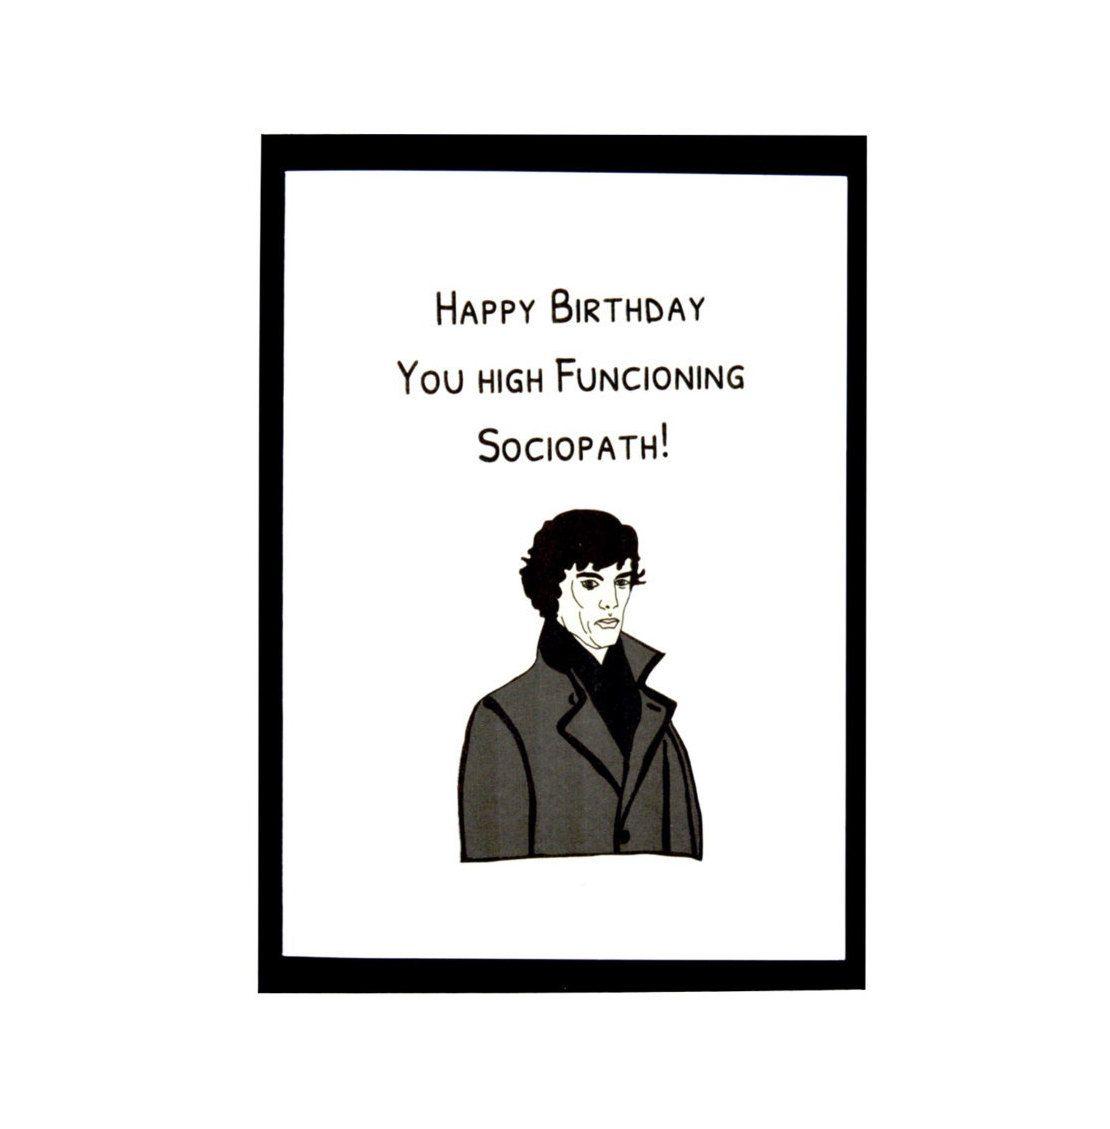 Greeting Card Sherlock Holmes Handmade Birthday Geeky For Him By PetitePolly On